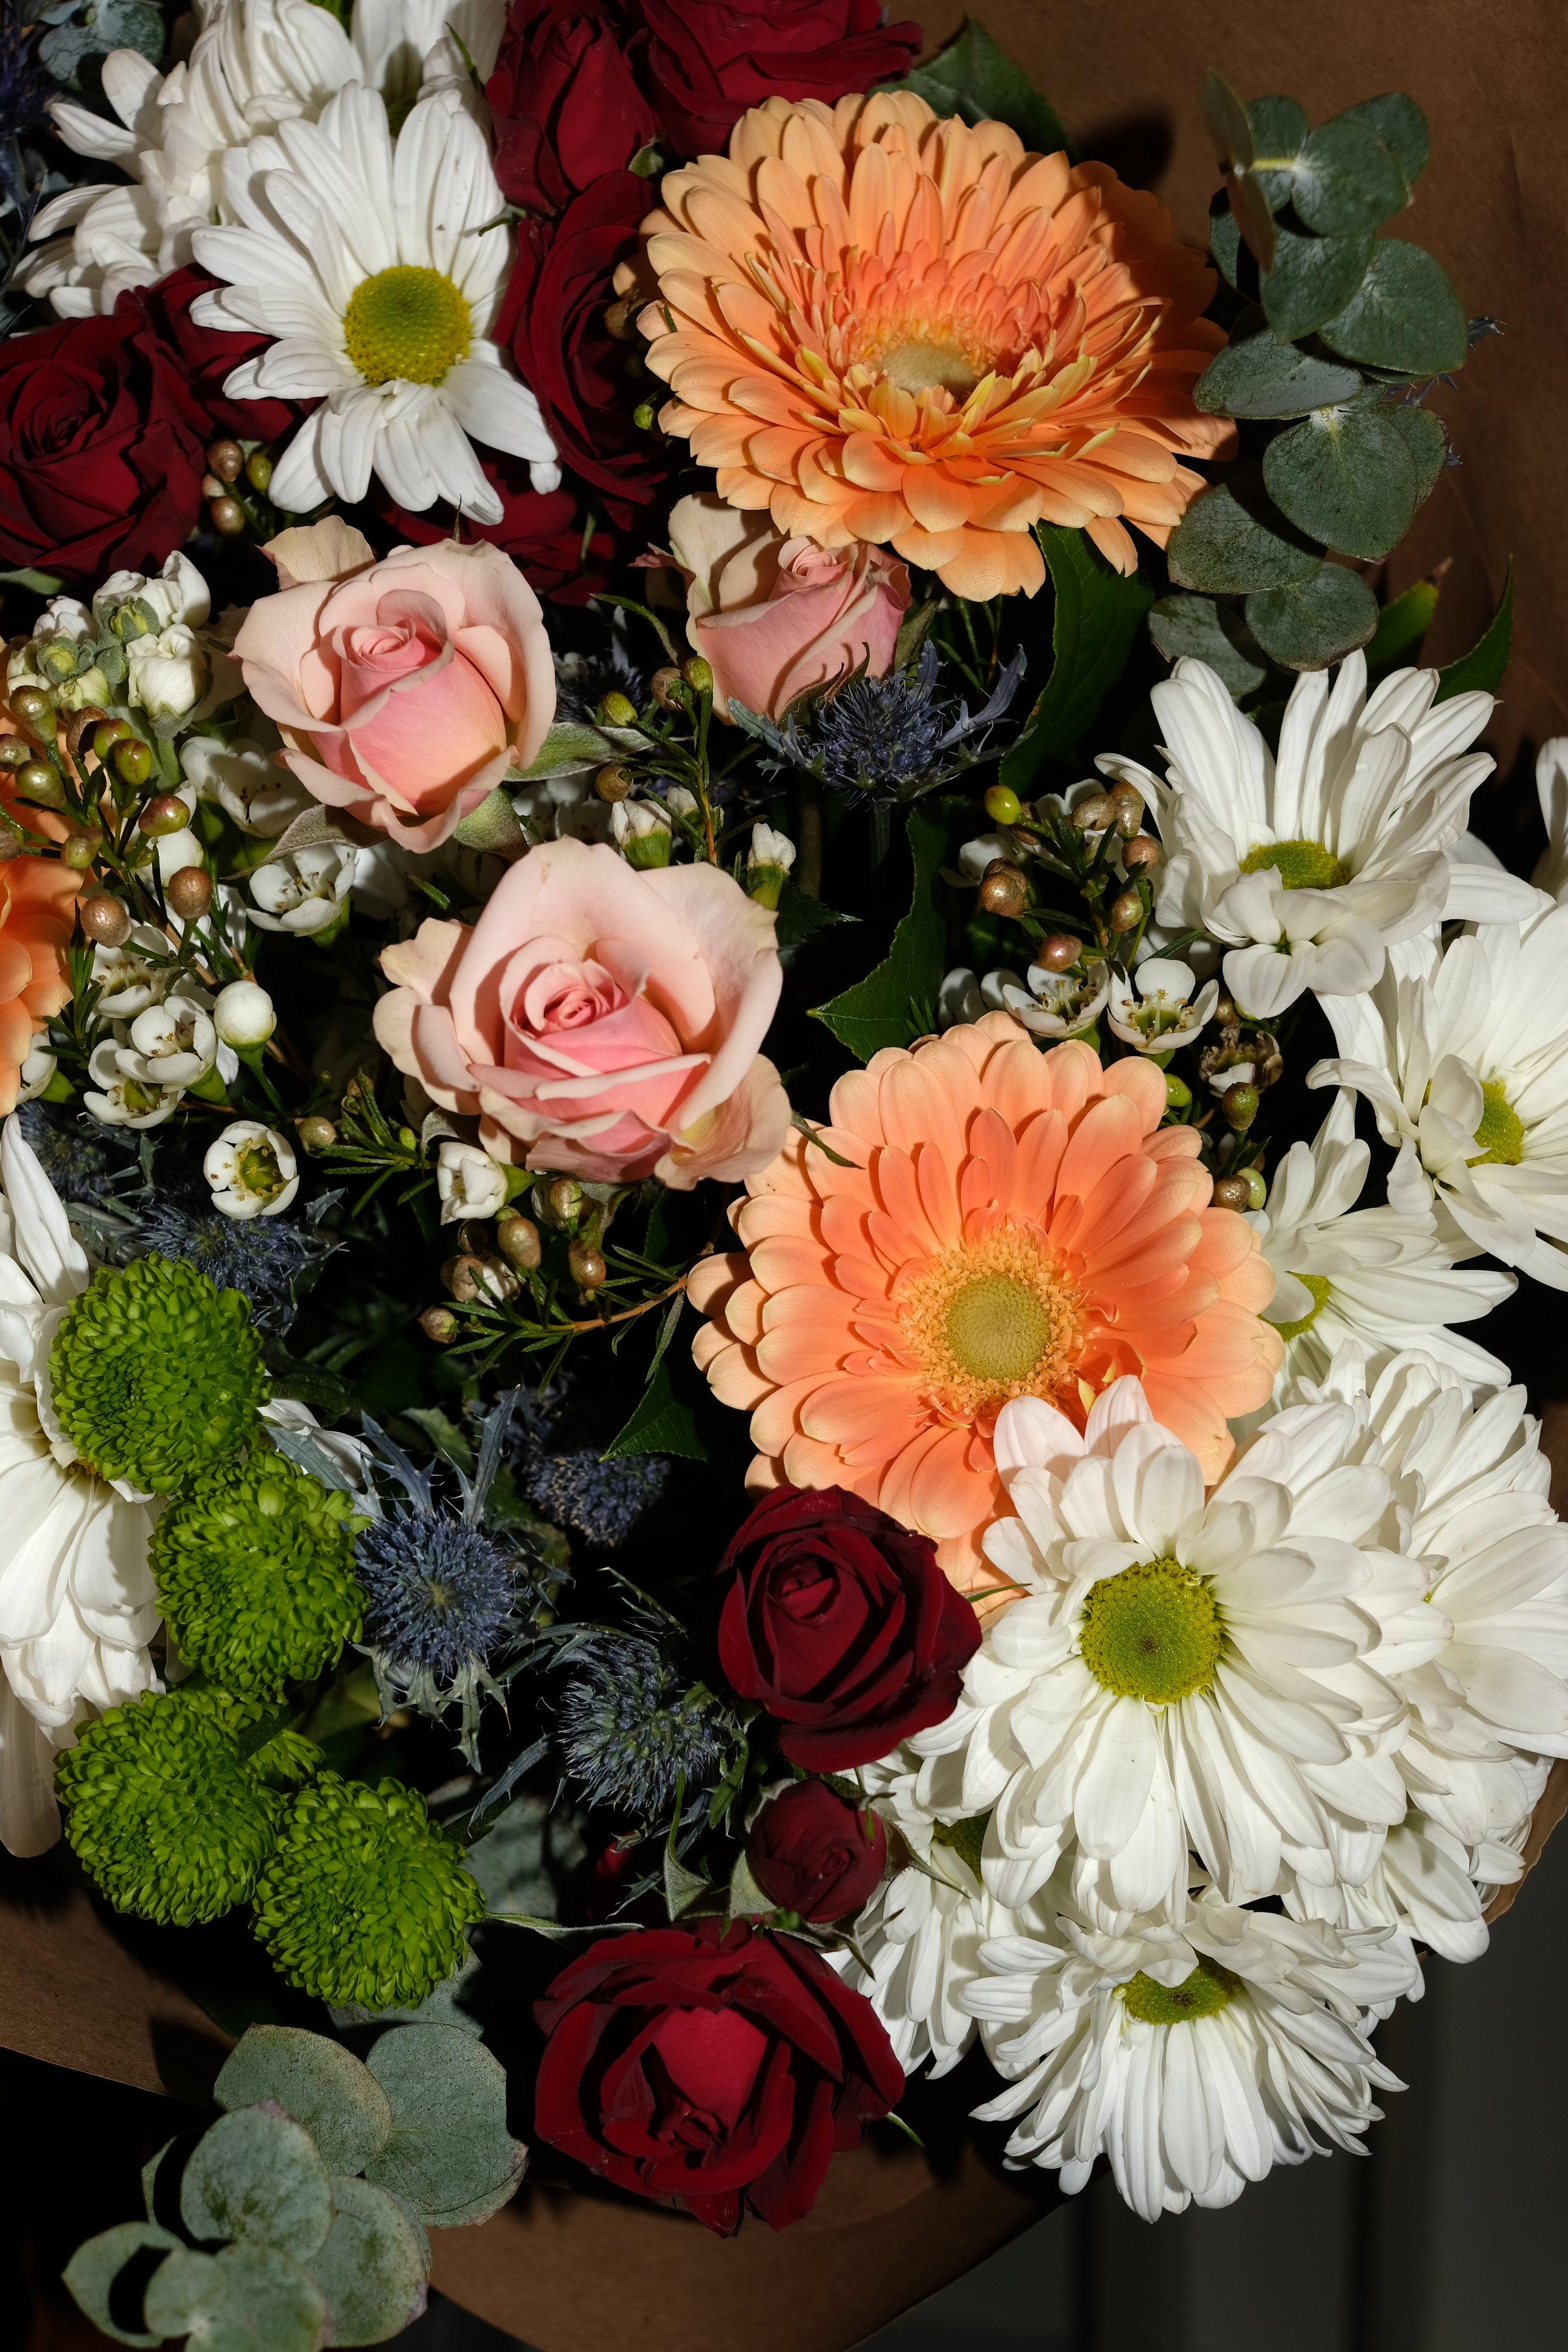 Birthday Bouquet for Jess, 2019